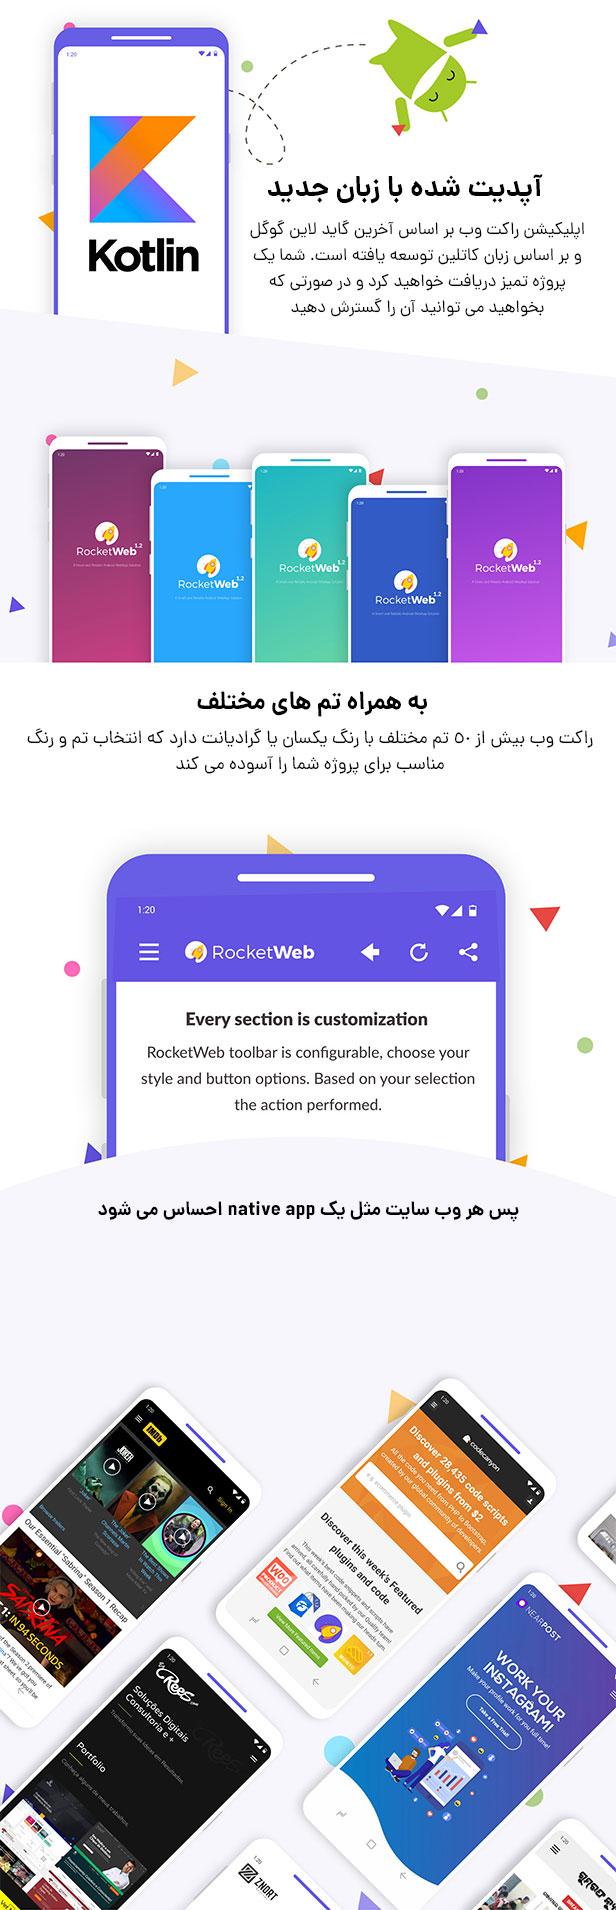 سورس اپلیکیشن RocketWeb